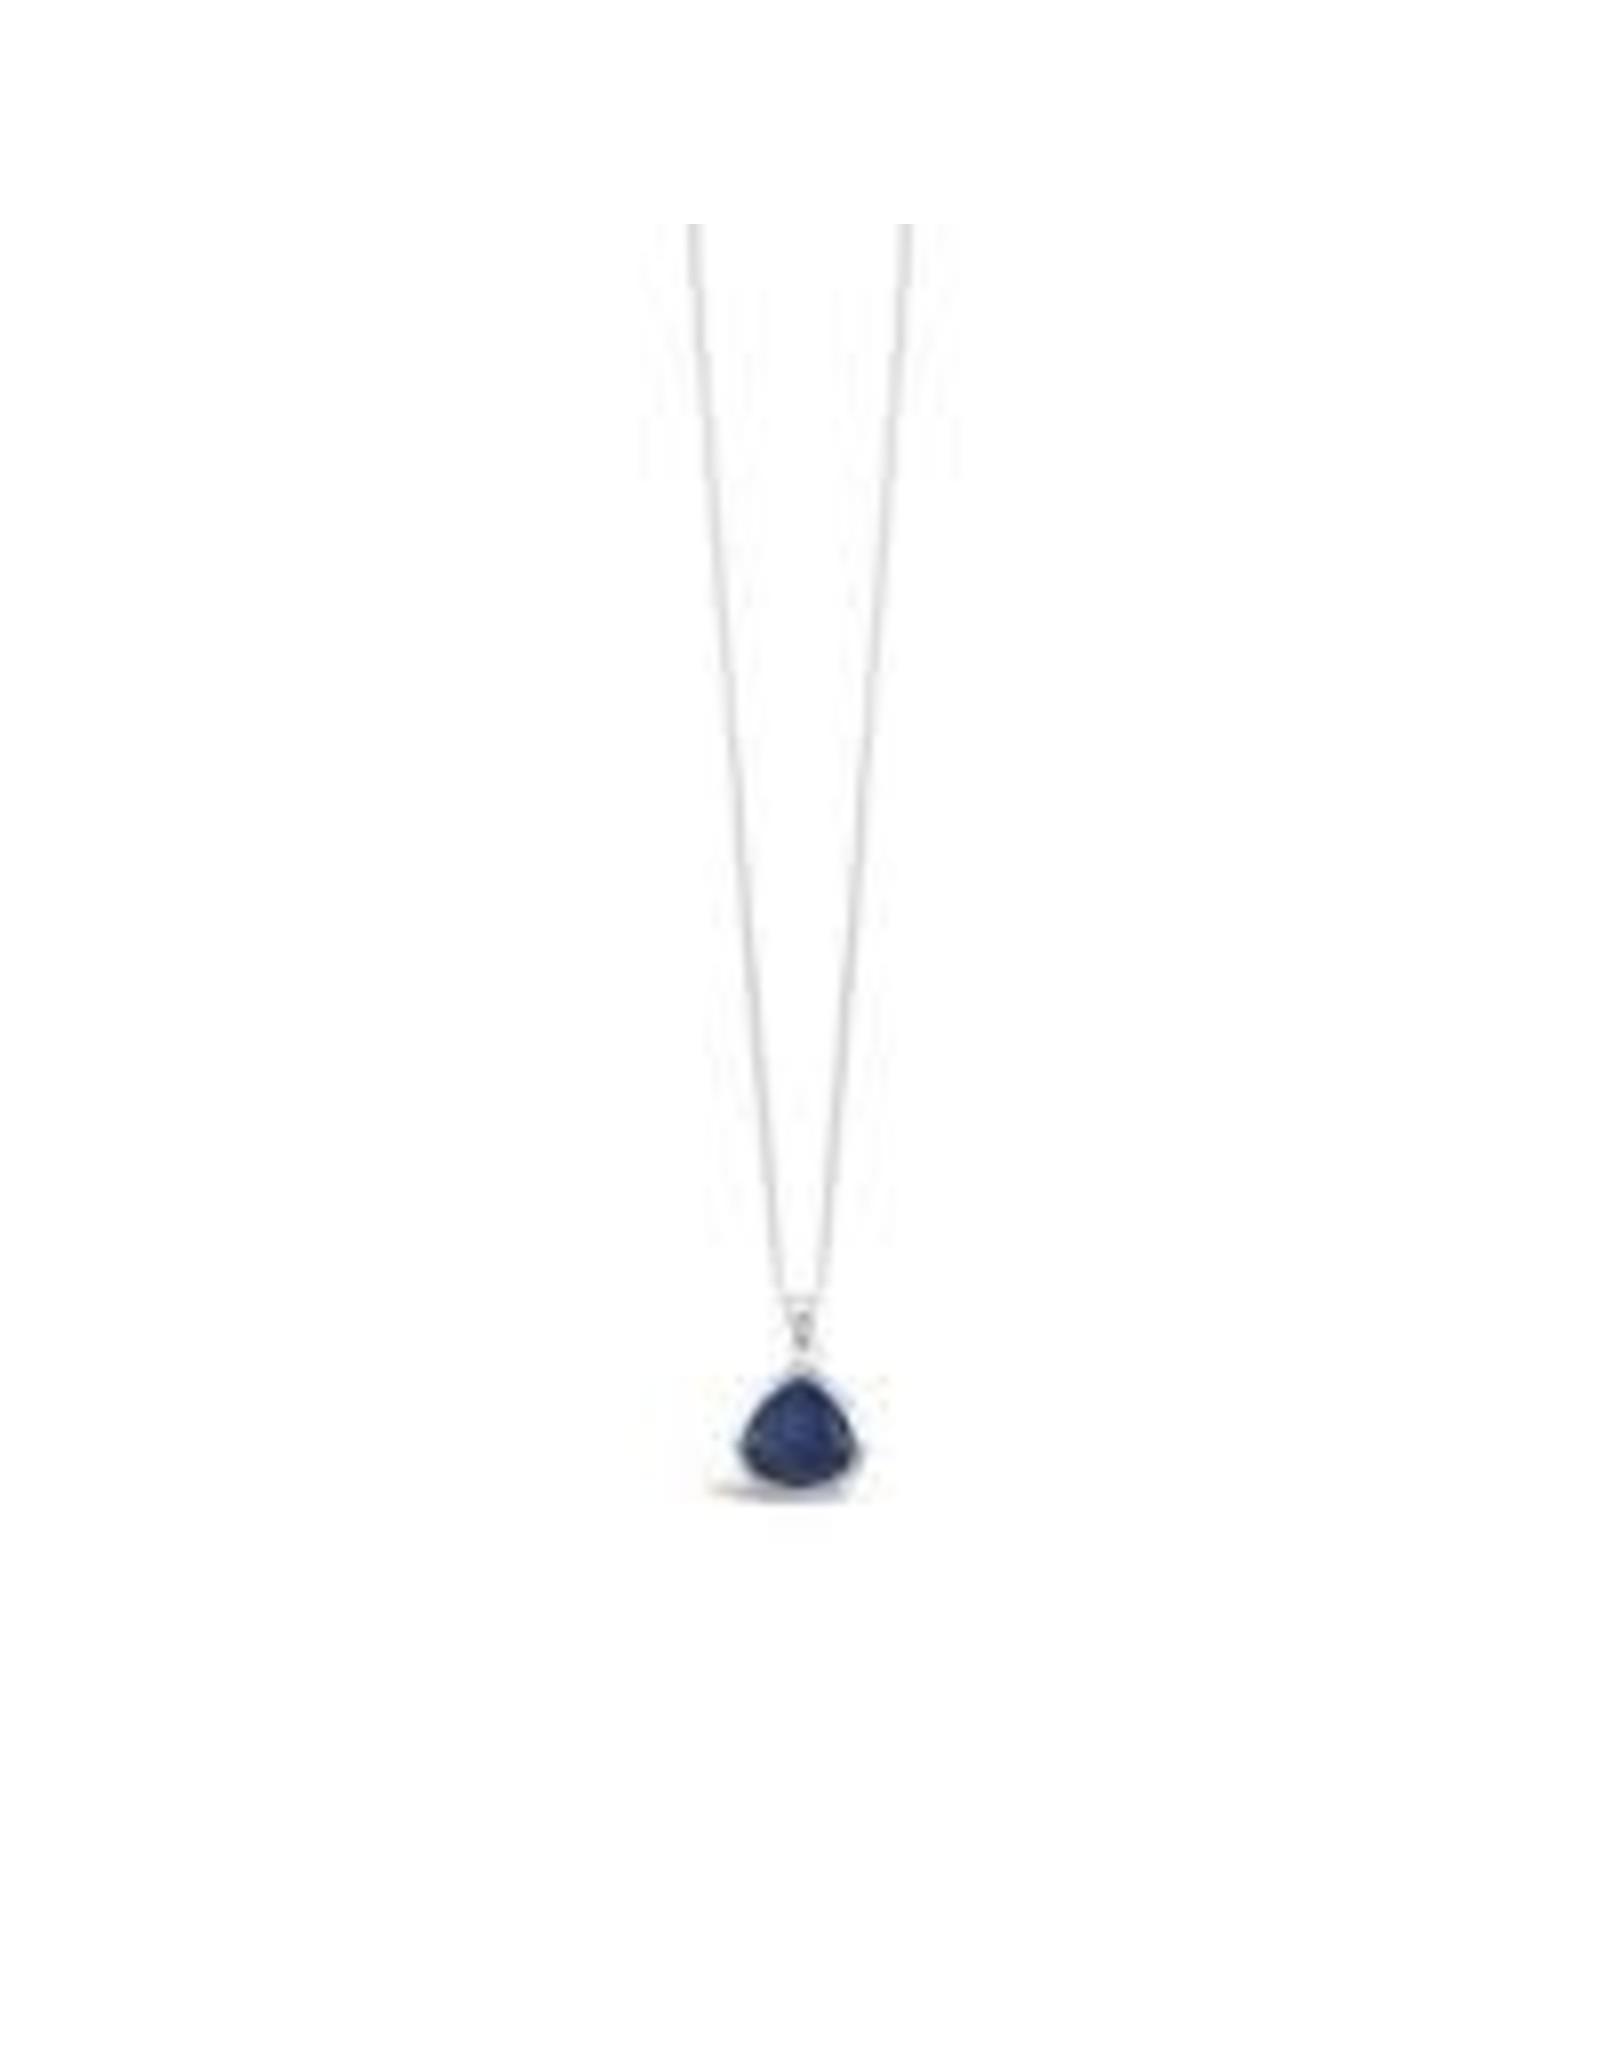 Stones & Silver Lapis Lazuli Teardrop Necklace 1cmx1.2cm with 40cm+5cm Ext (925 SS)